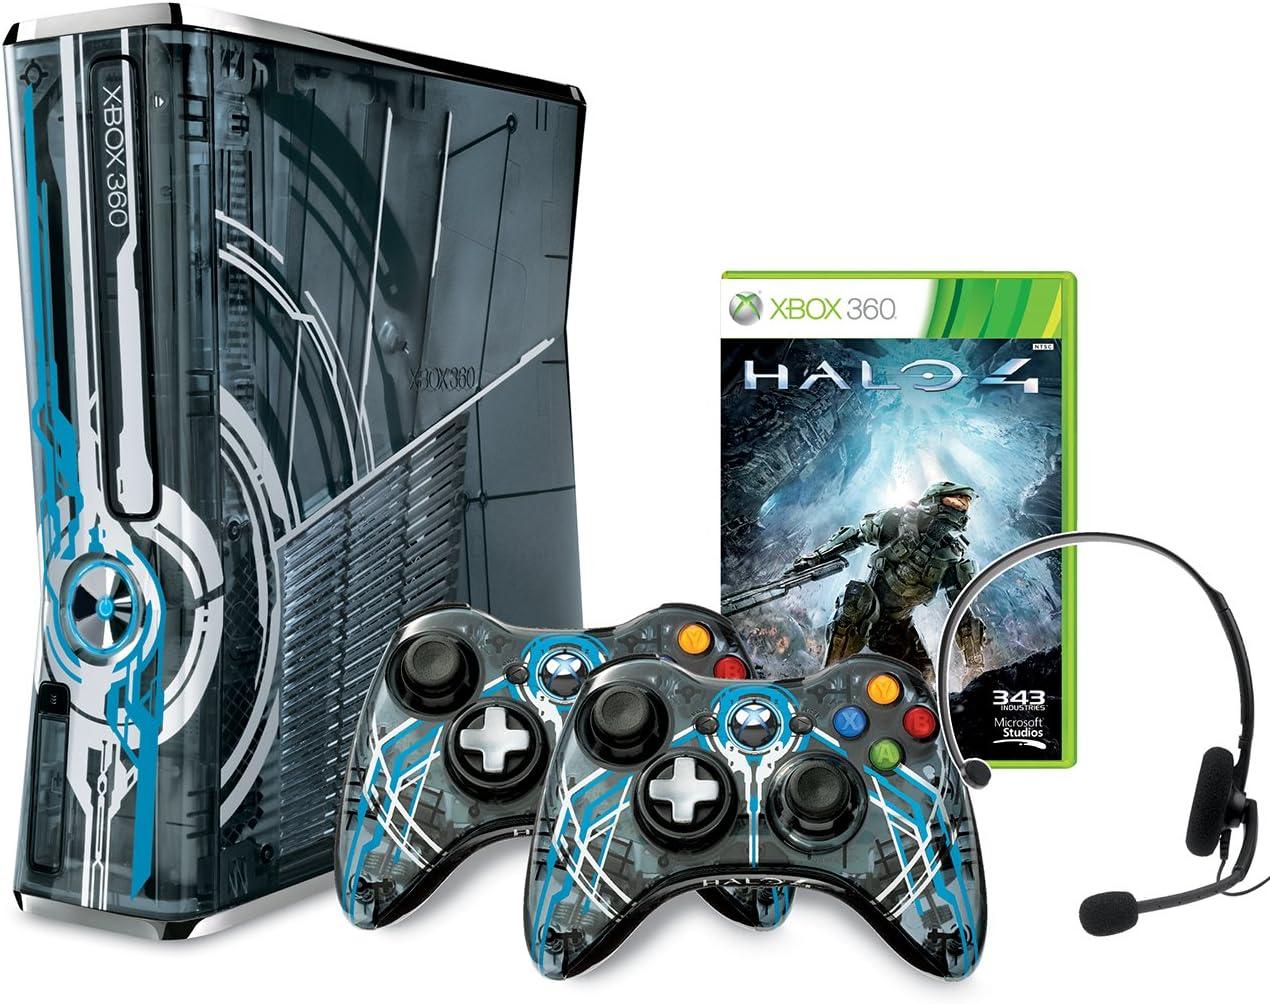 Amazon.com: Xbox 360 Limited Edition Halo 4 Bundle: Video Games